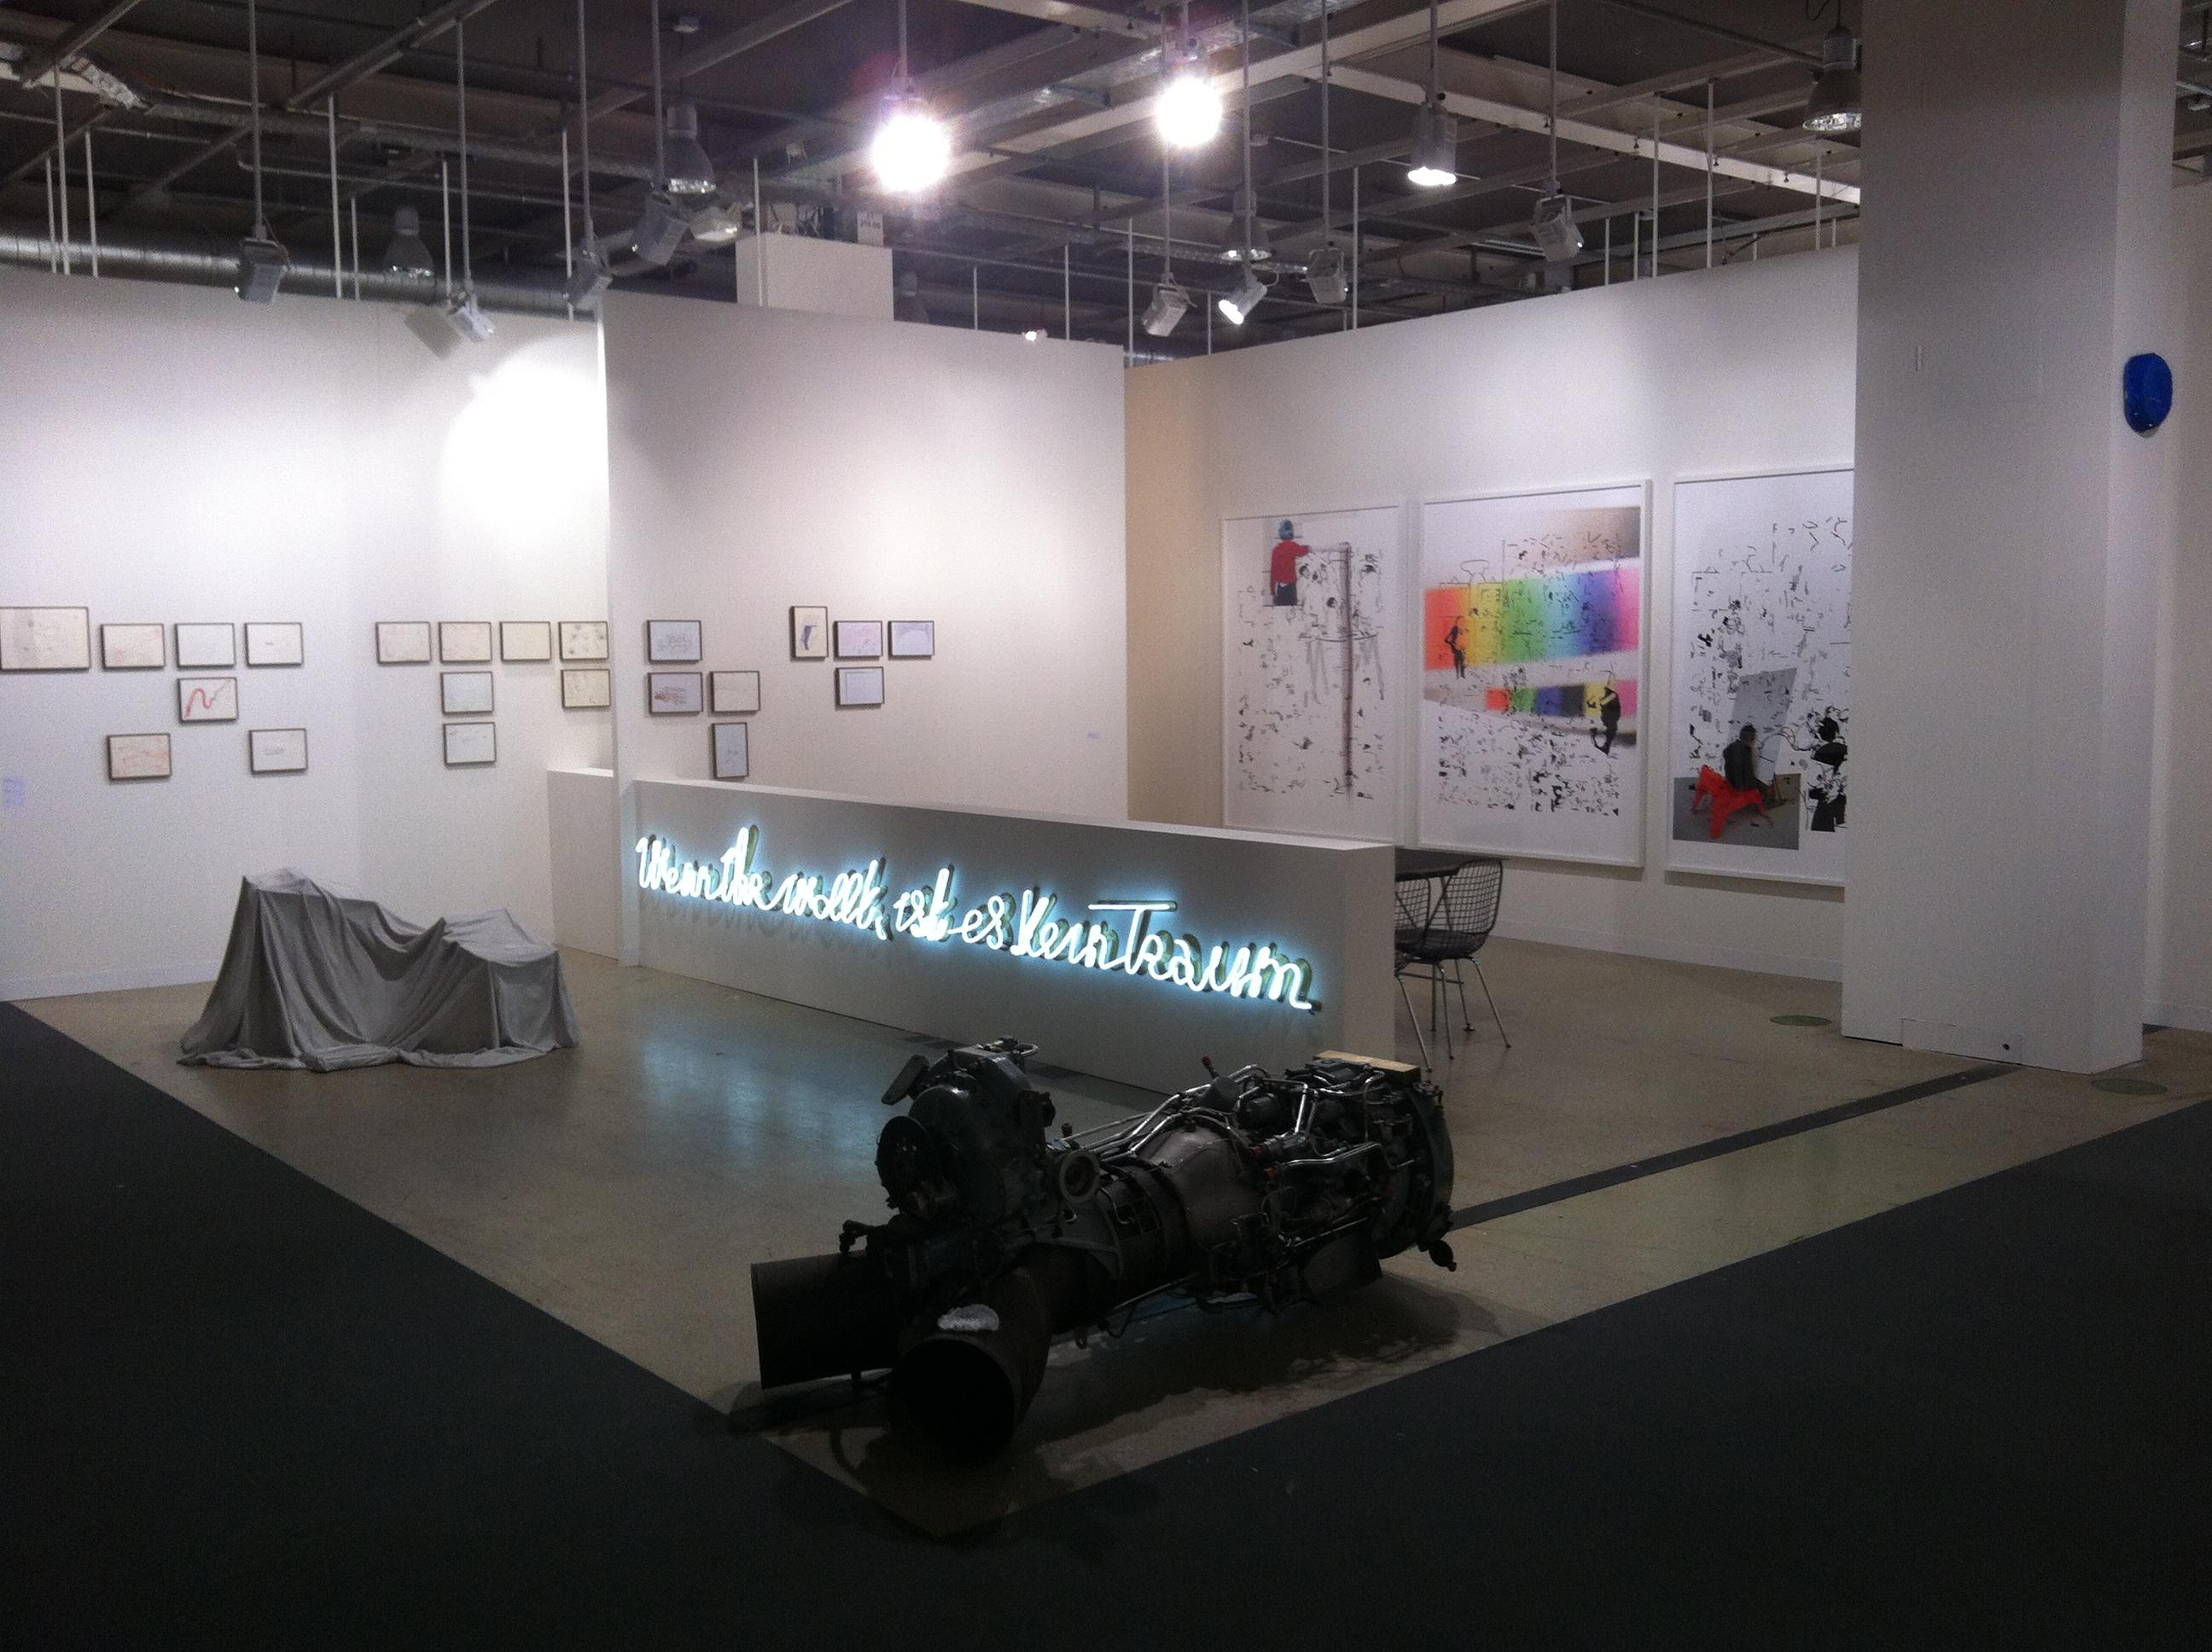 Annet Gelink Gallery at Art Basel 1